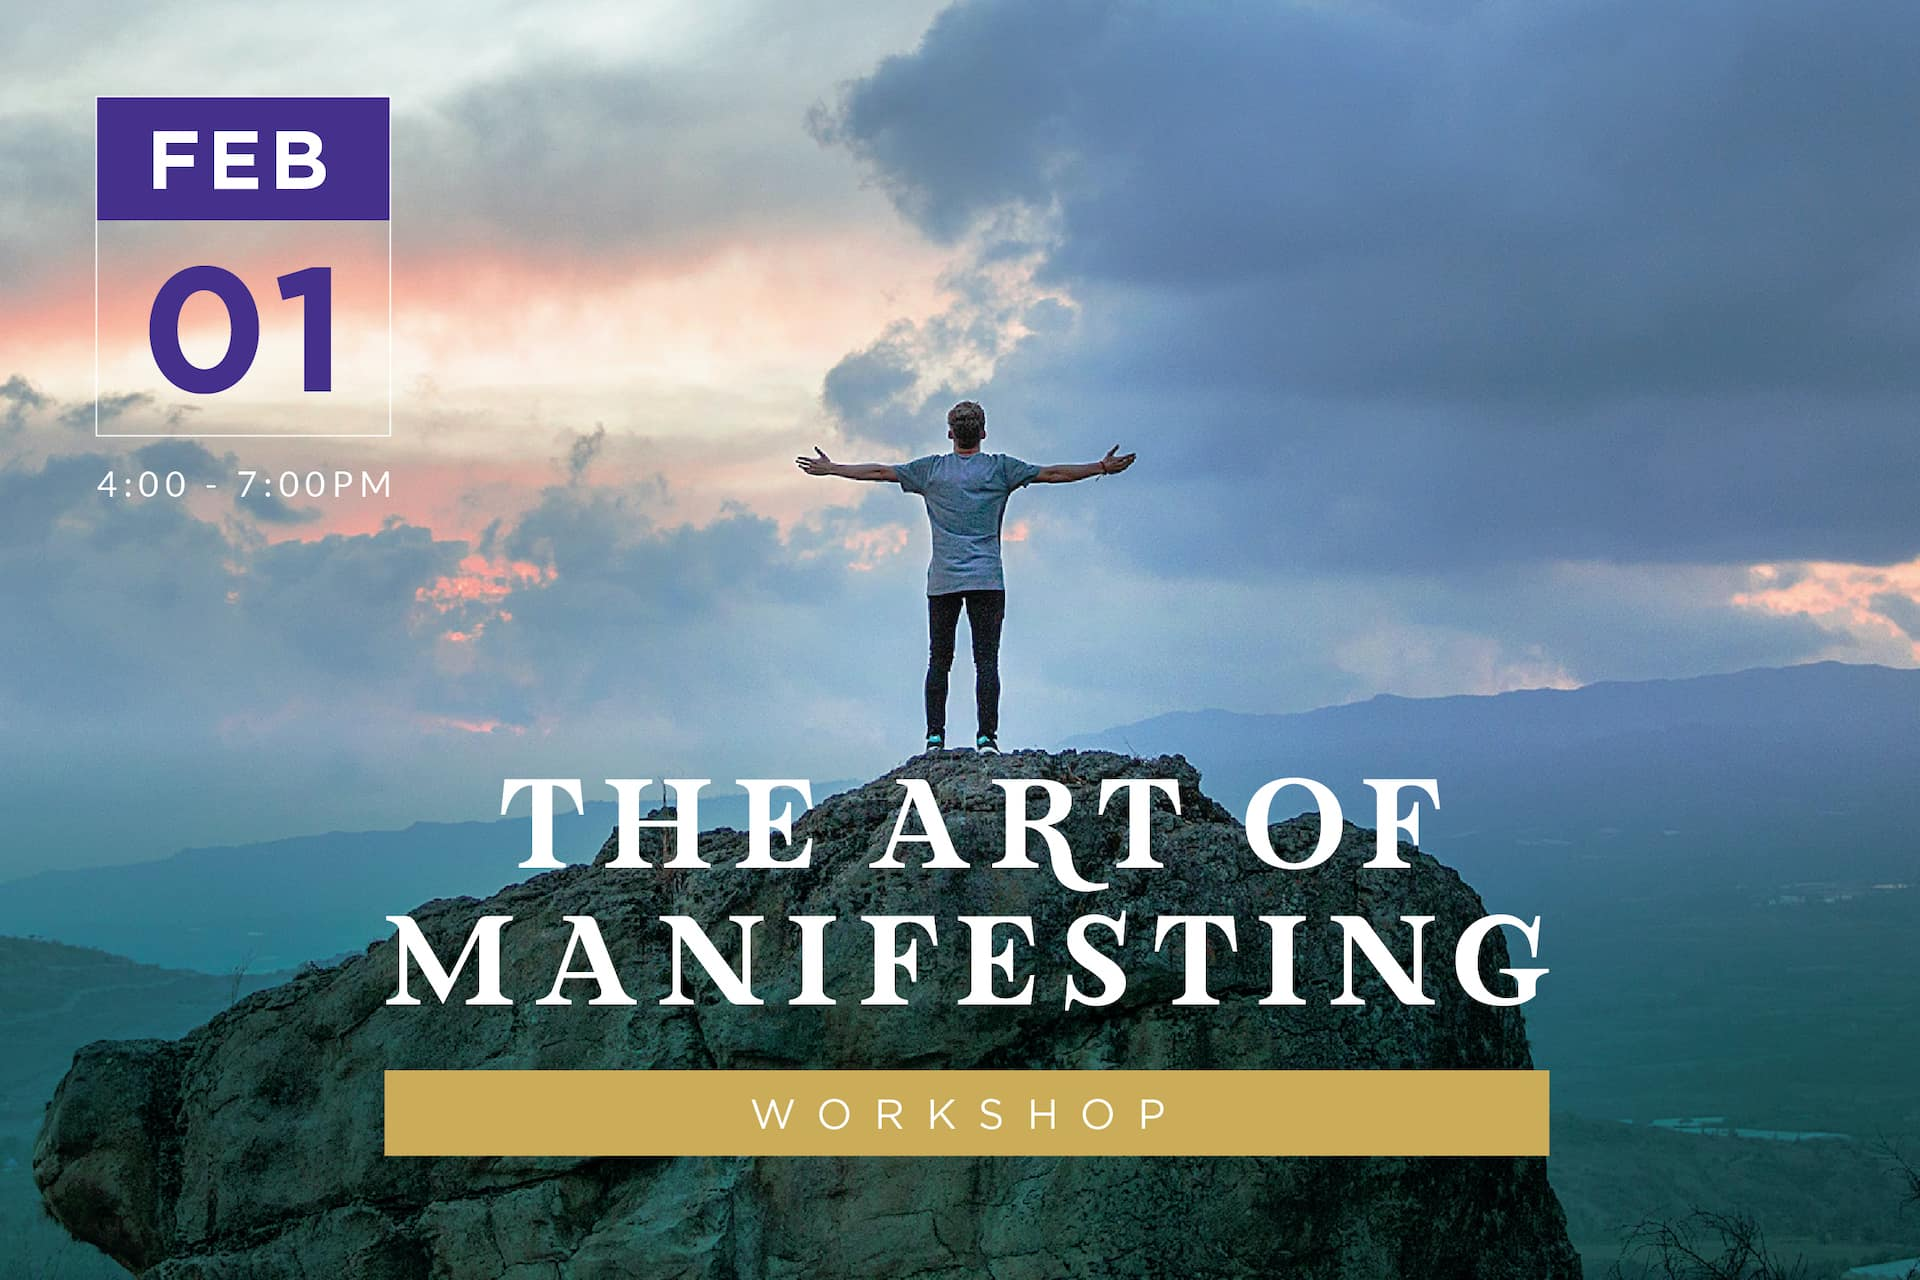 The Art of Manifesting